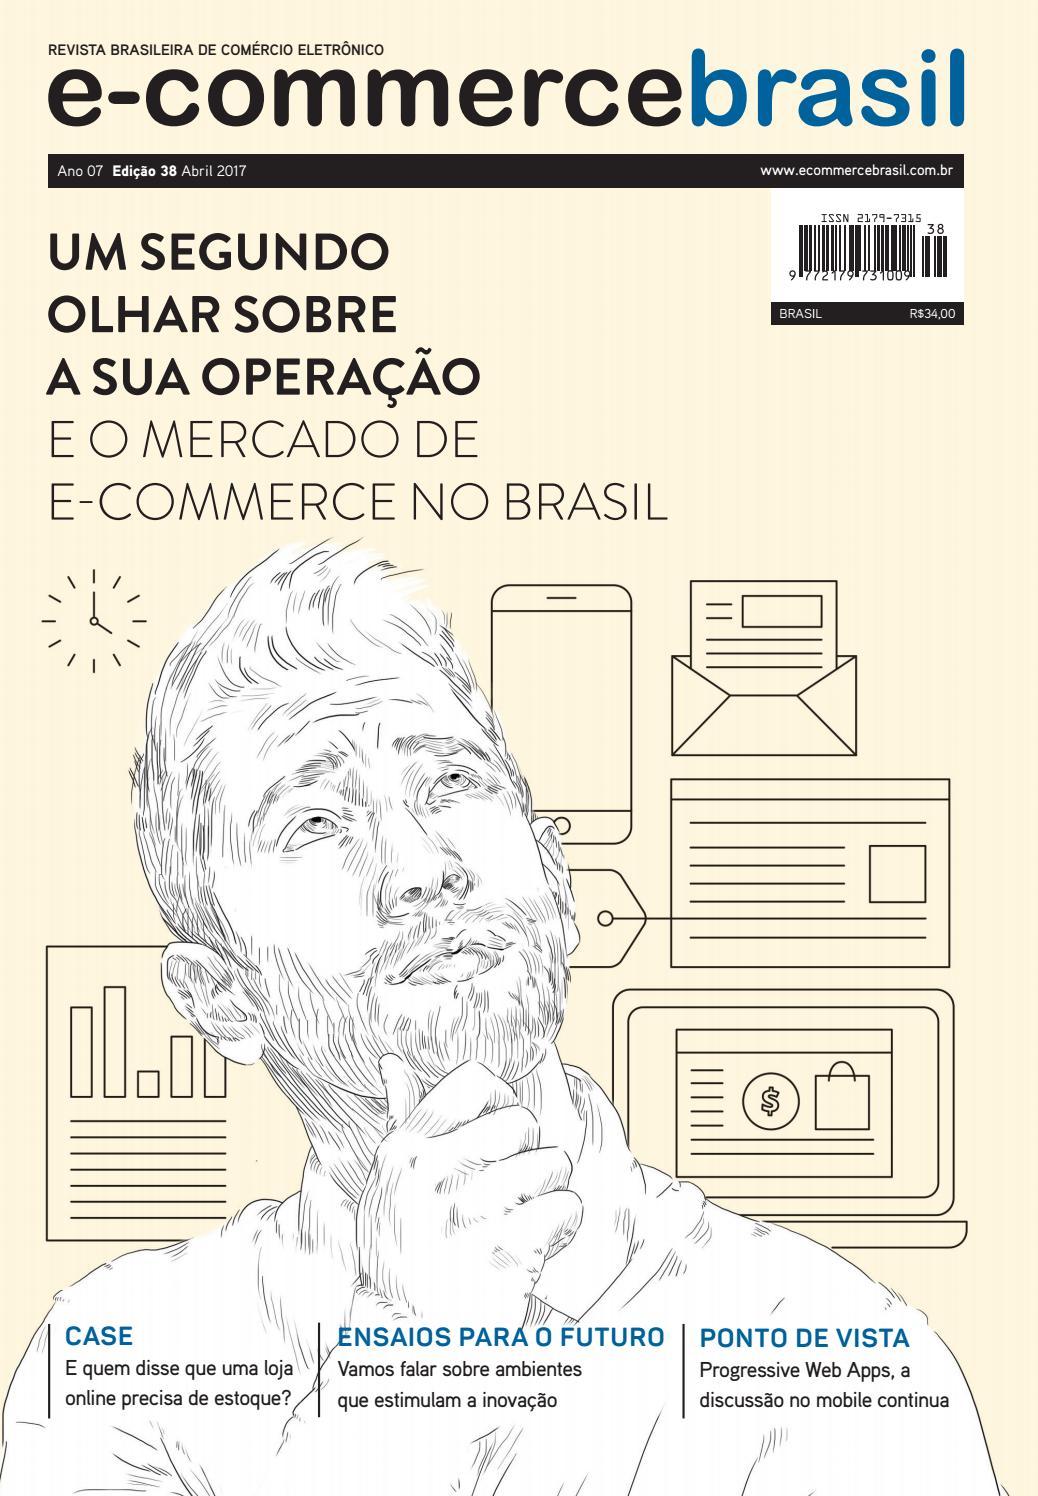 E commerce 38 v9 final issuu by E-Commerce Brasil - issuu a5d468aad47